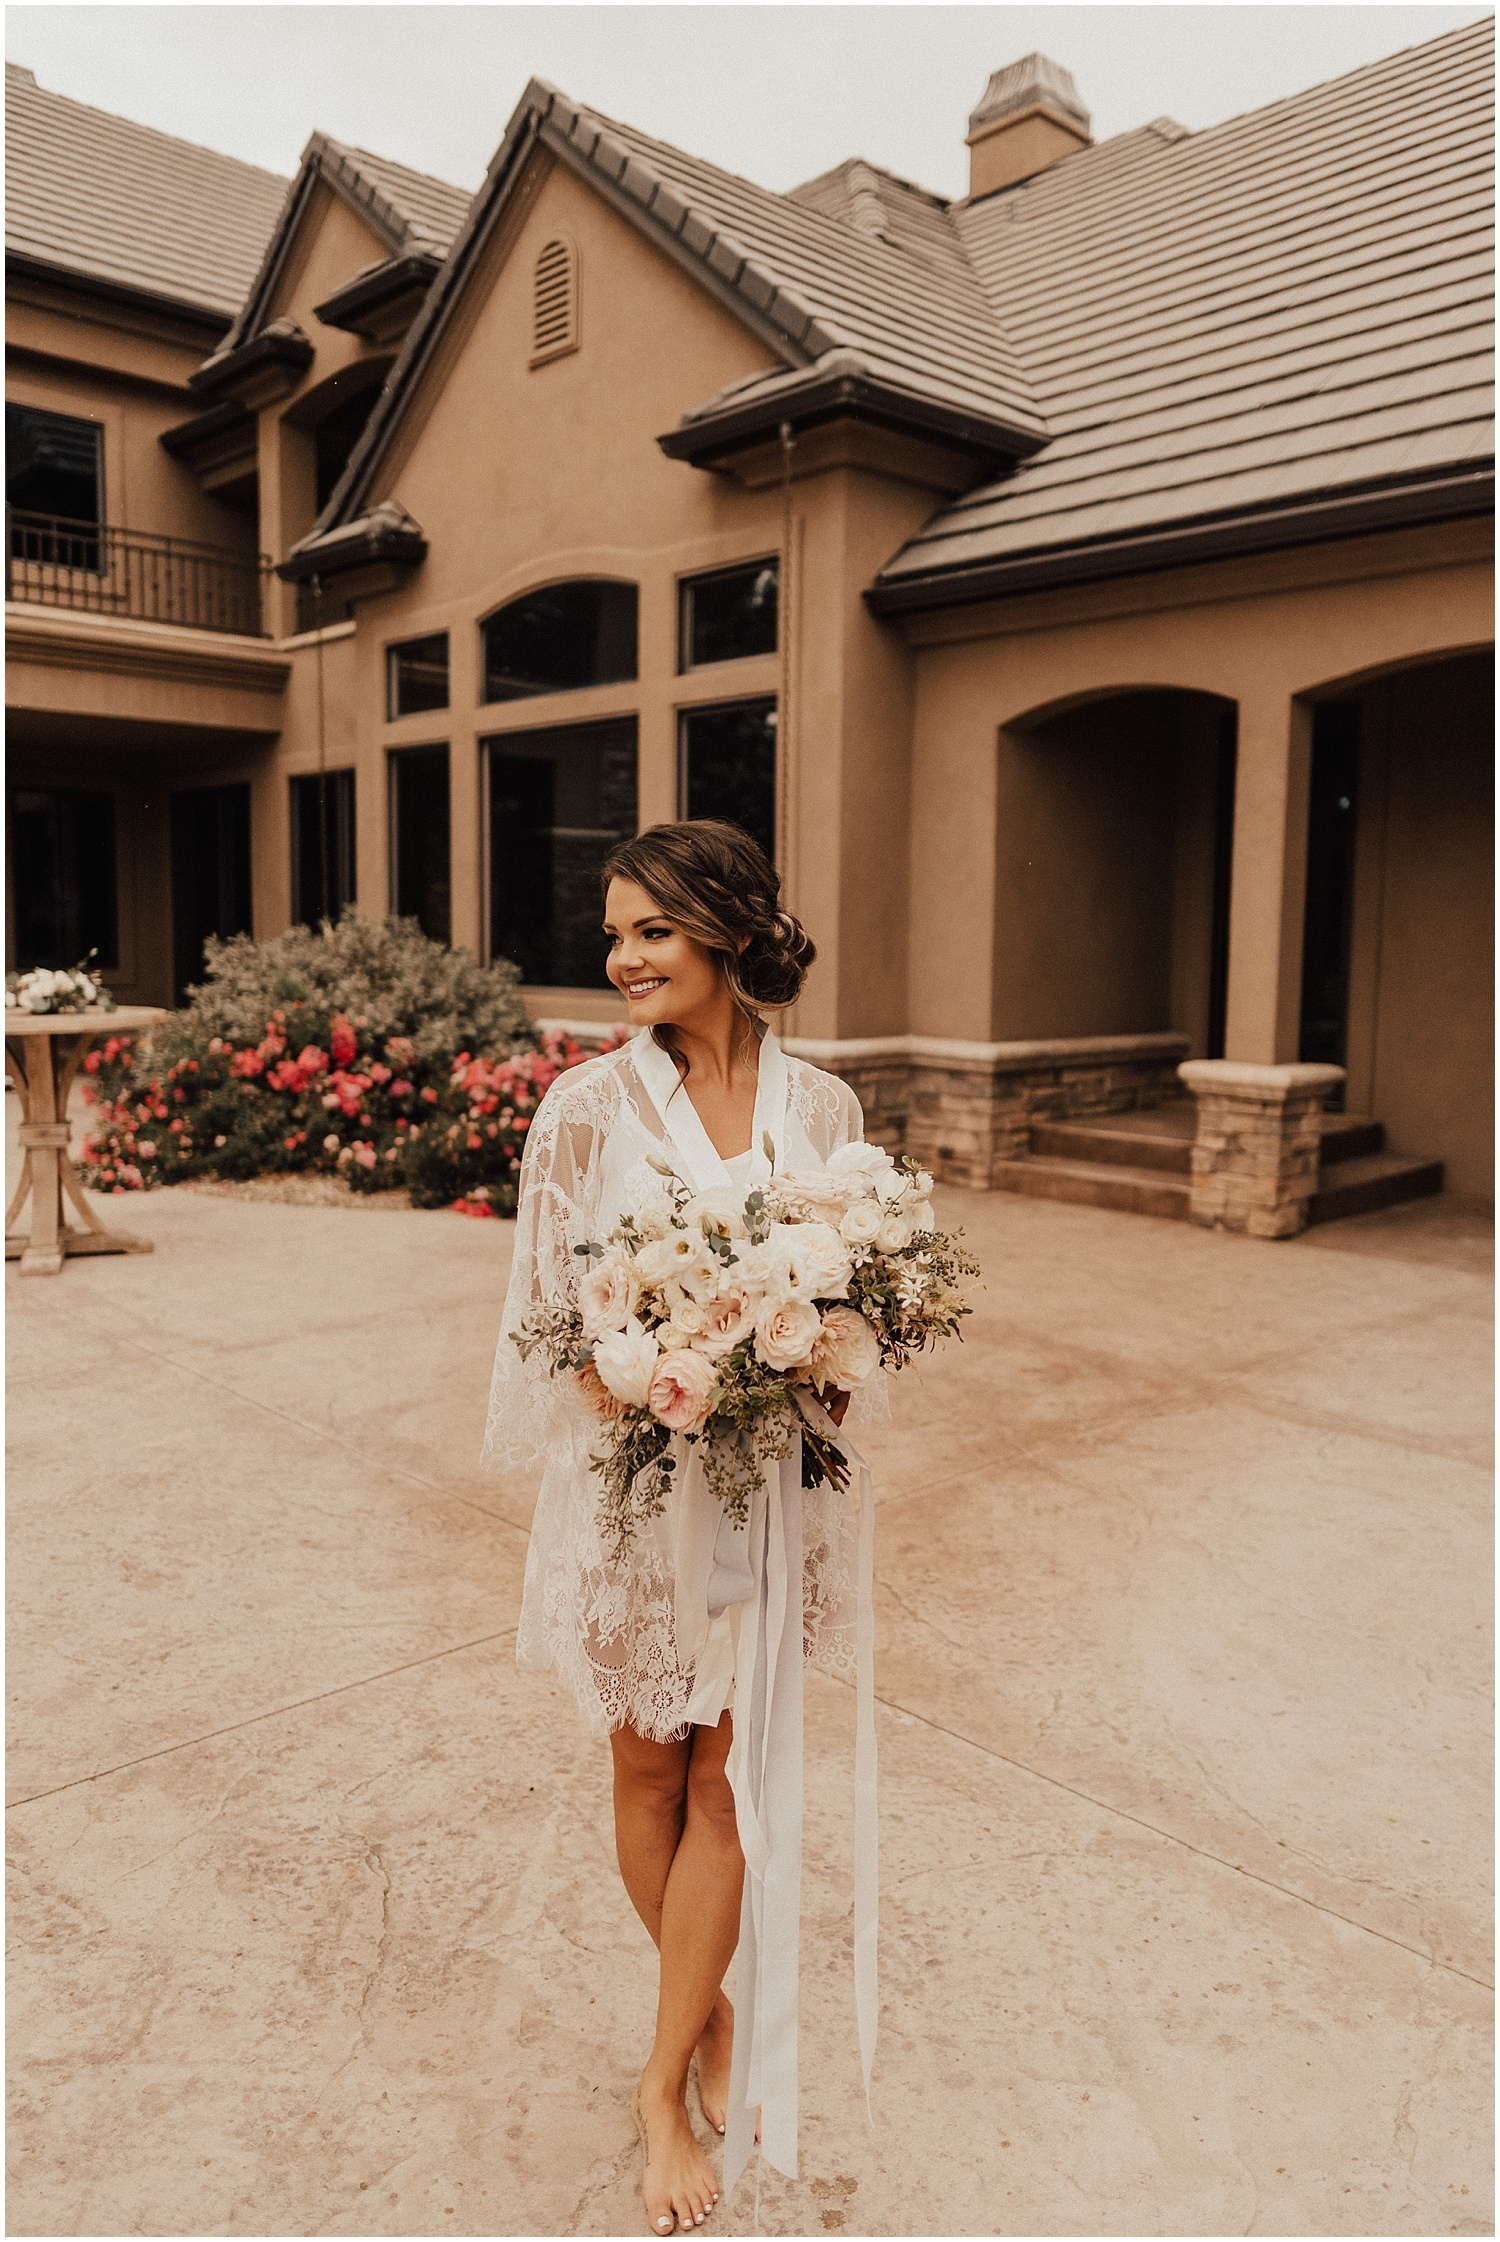 whimsical-summer-wedding-boise-idaho-las-vegas-bride60.jpg